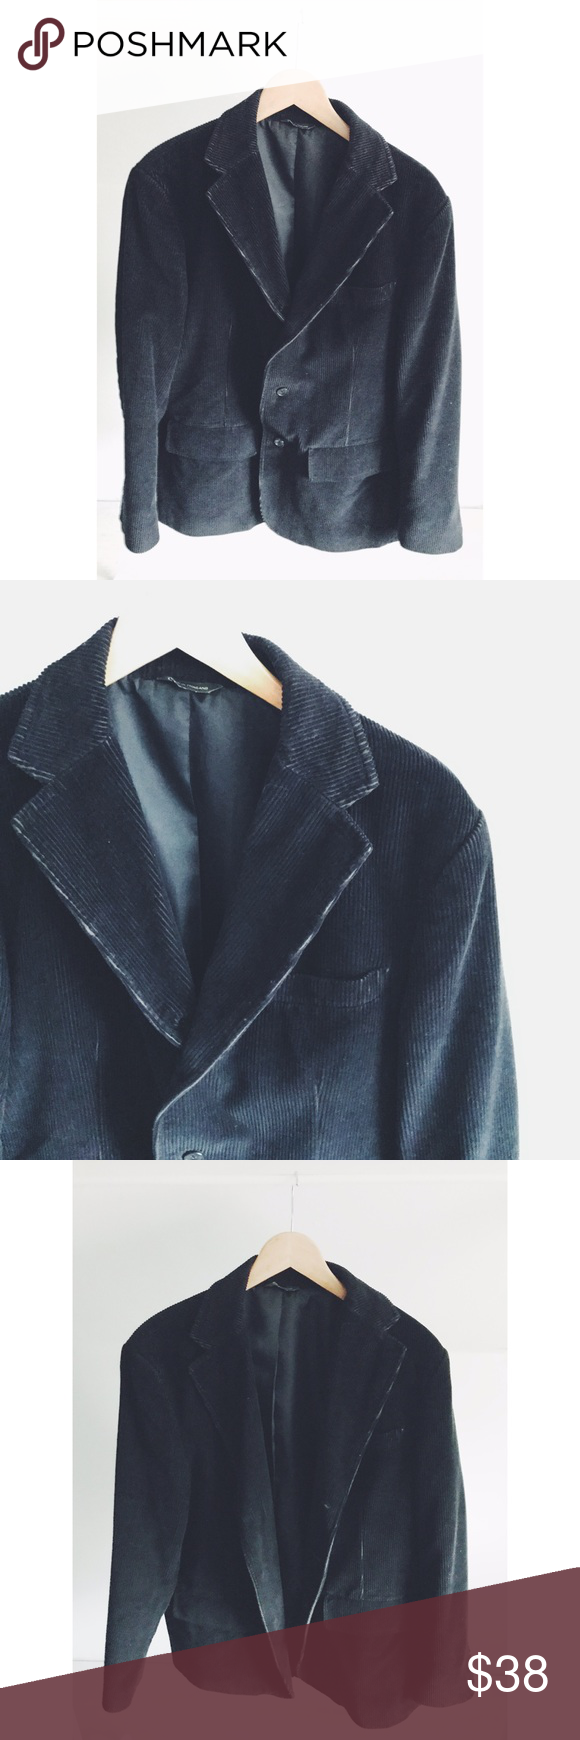 Eddie Bauer Corduroy Blazer Jacket Black color in a soft